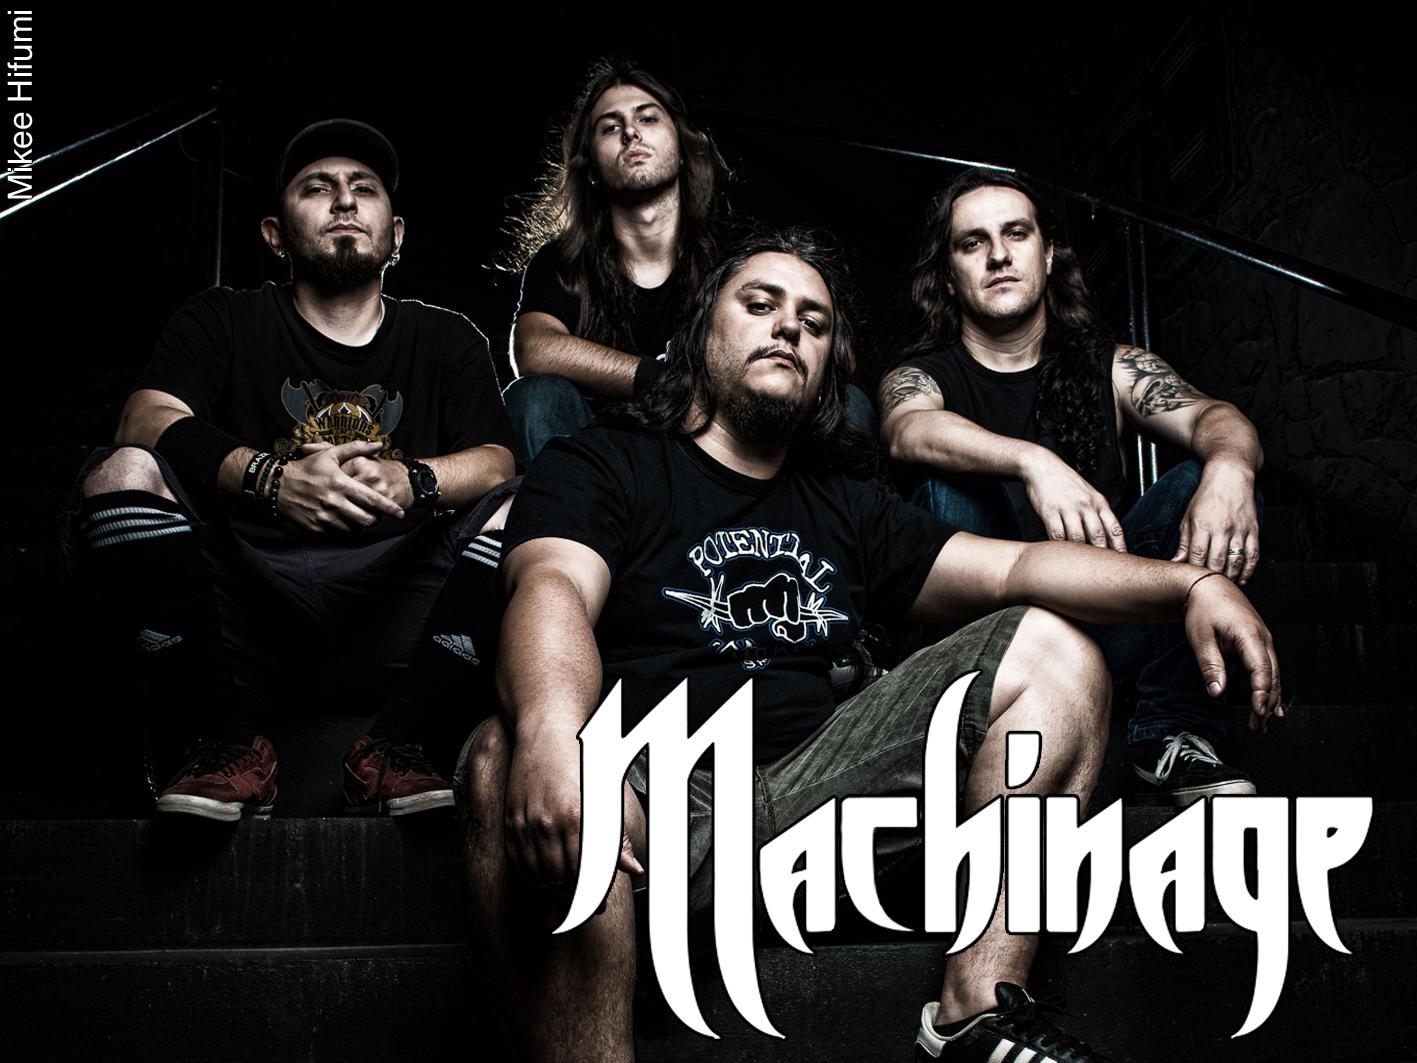 heavy metal discografia download